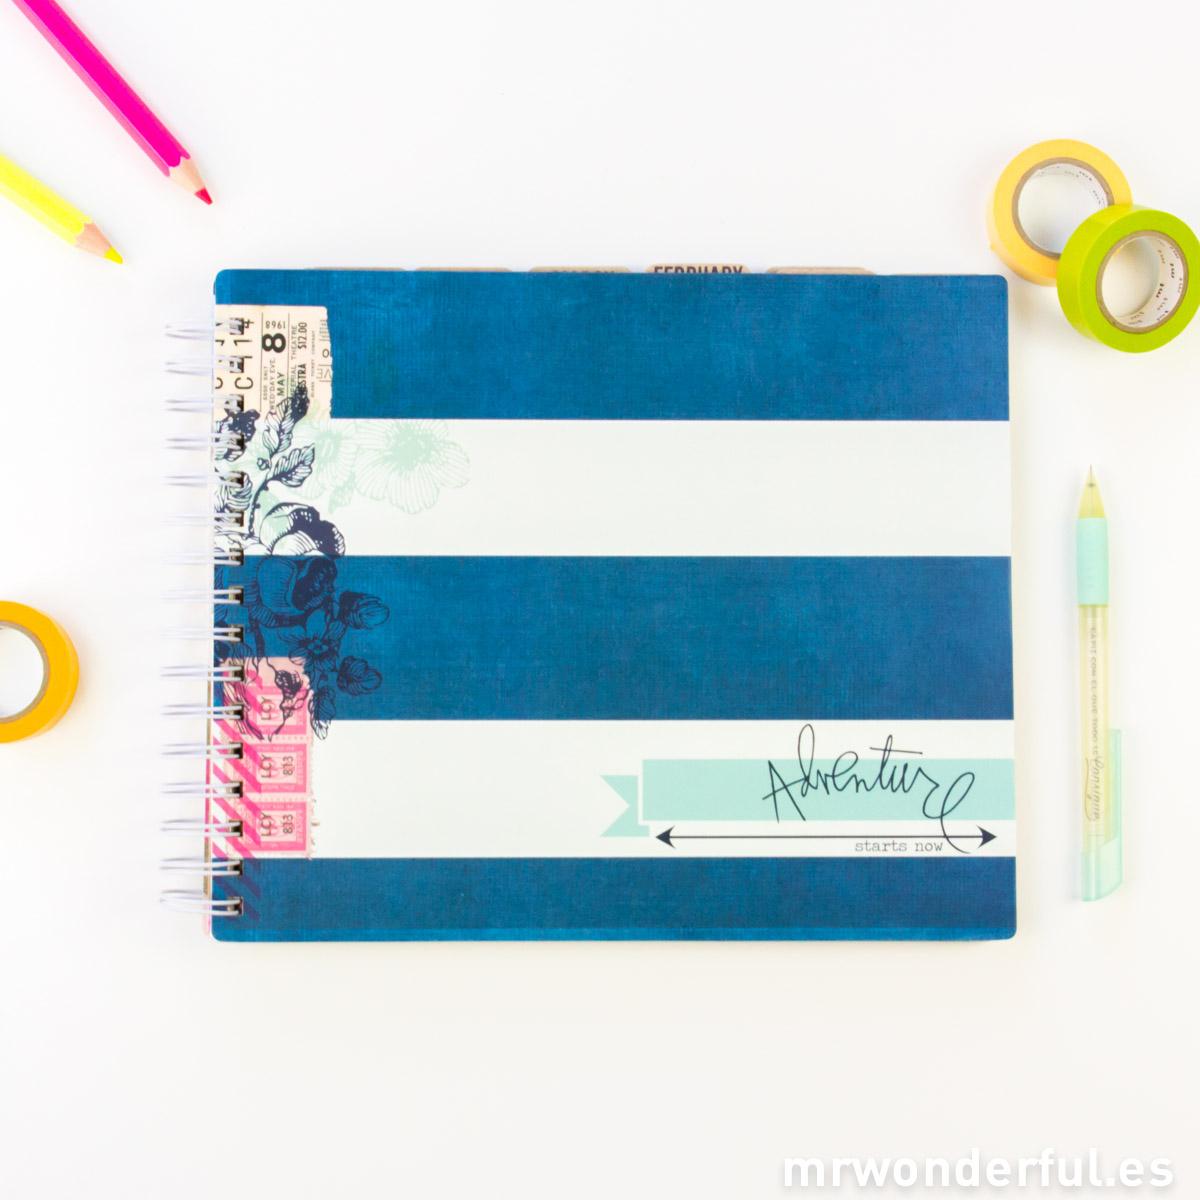 mrwonderful_01113_album-scrapbook-memory-planner-5